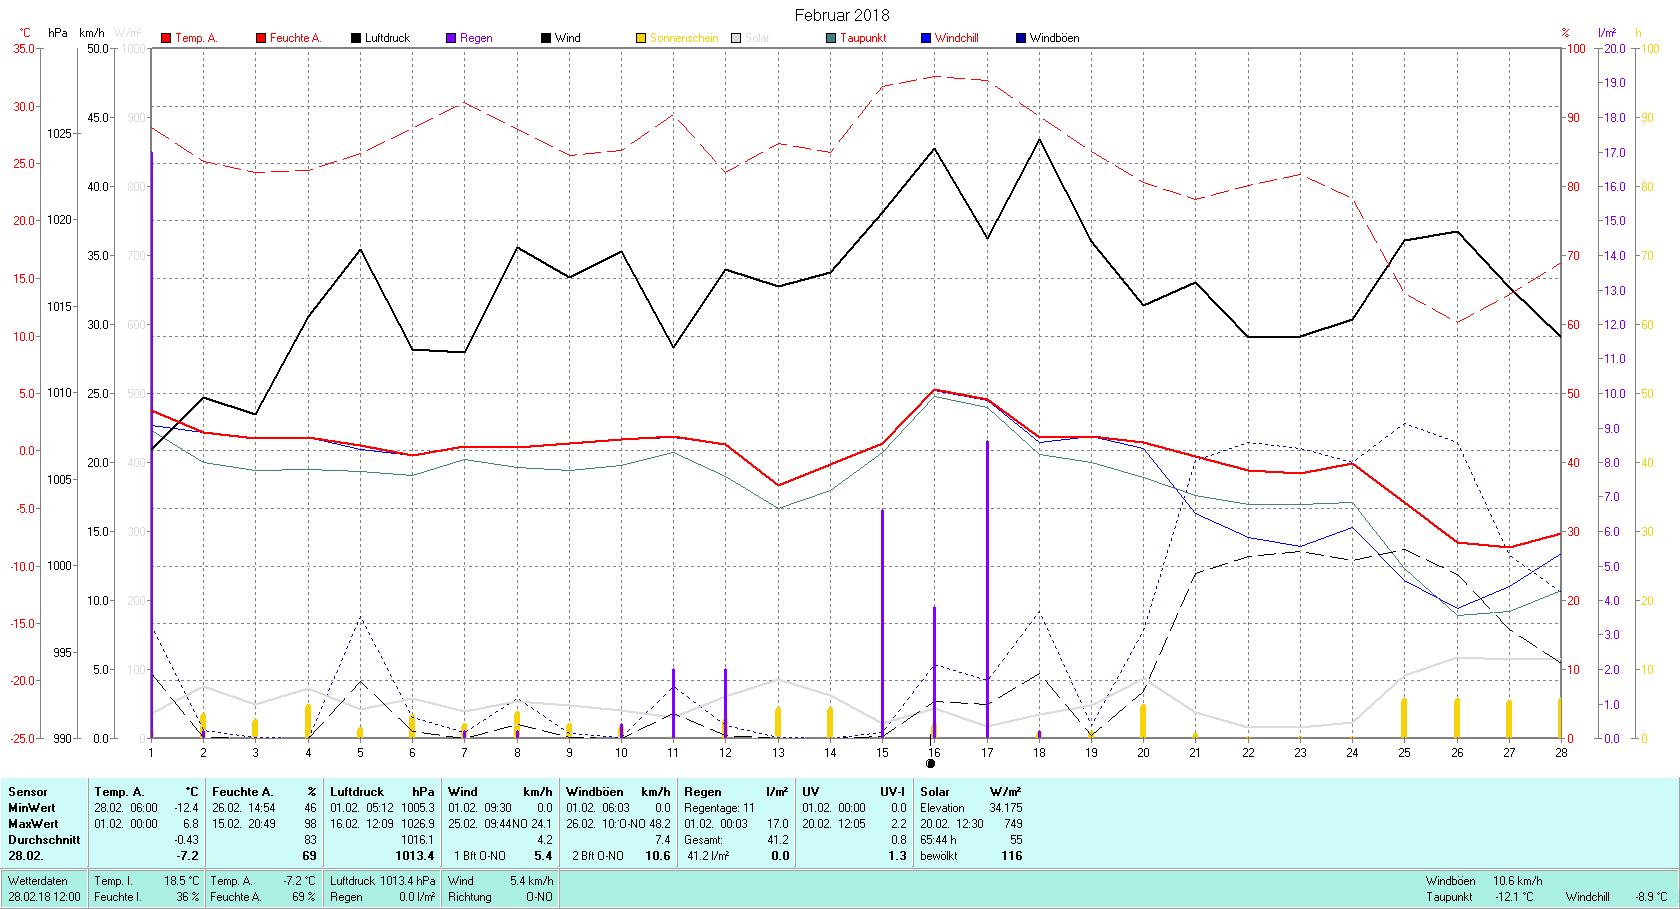 Februar 2018 Tmin -12.4°C, Tmax 6.8°C, Sonne 65:44 h, Niederschlag 41.2mm/2